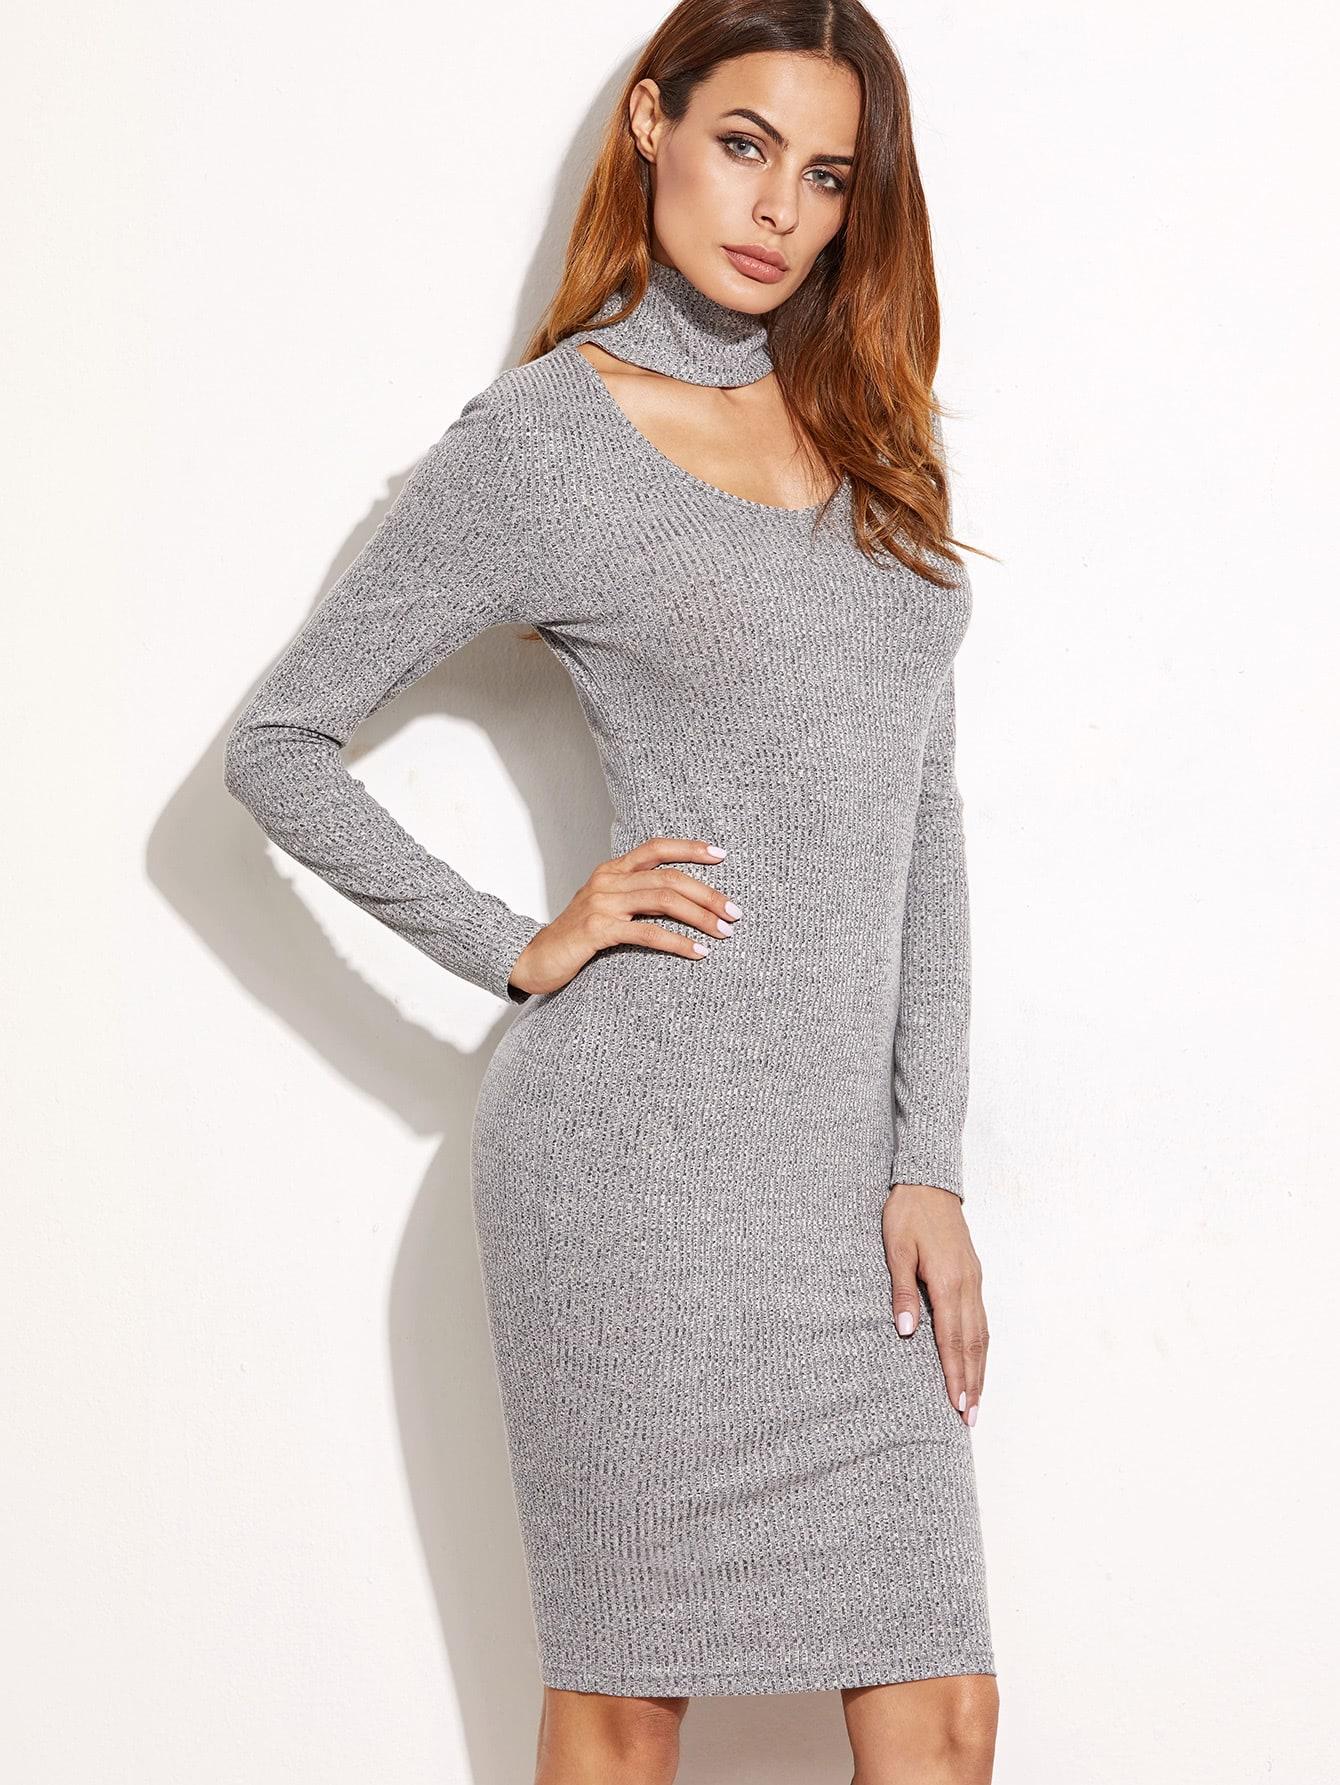 Cutout Choker Neckline Ribbed Knit Dress dress161103712